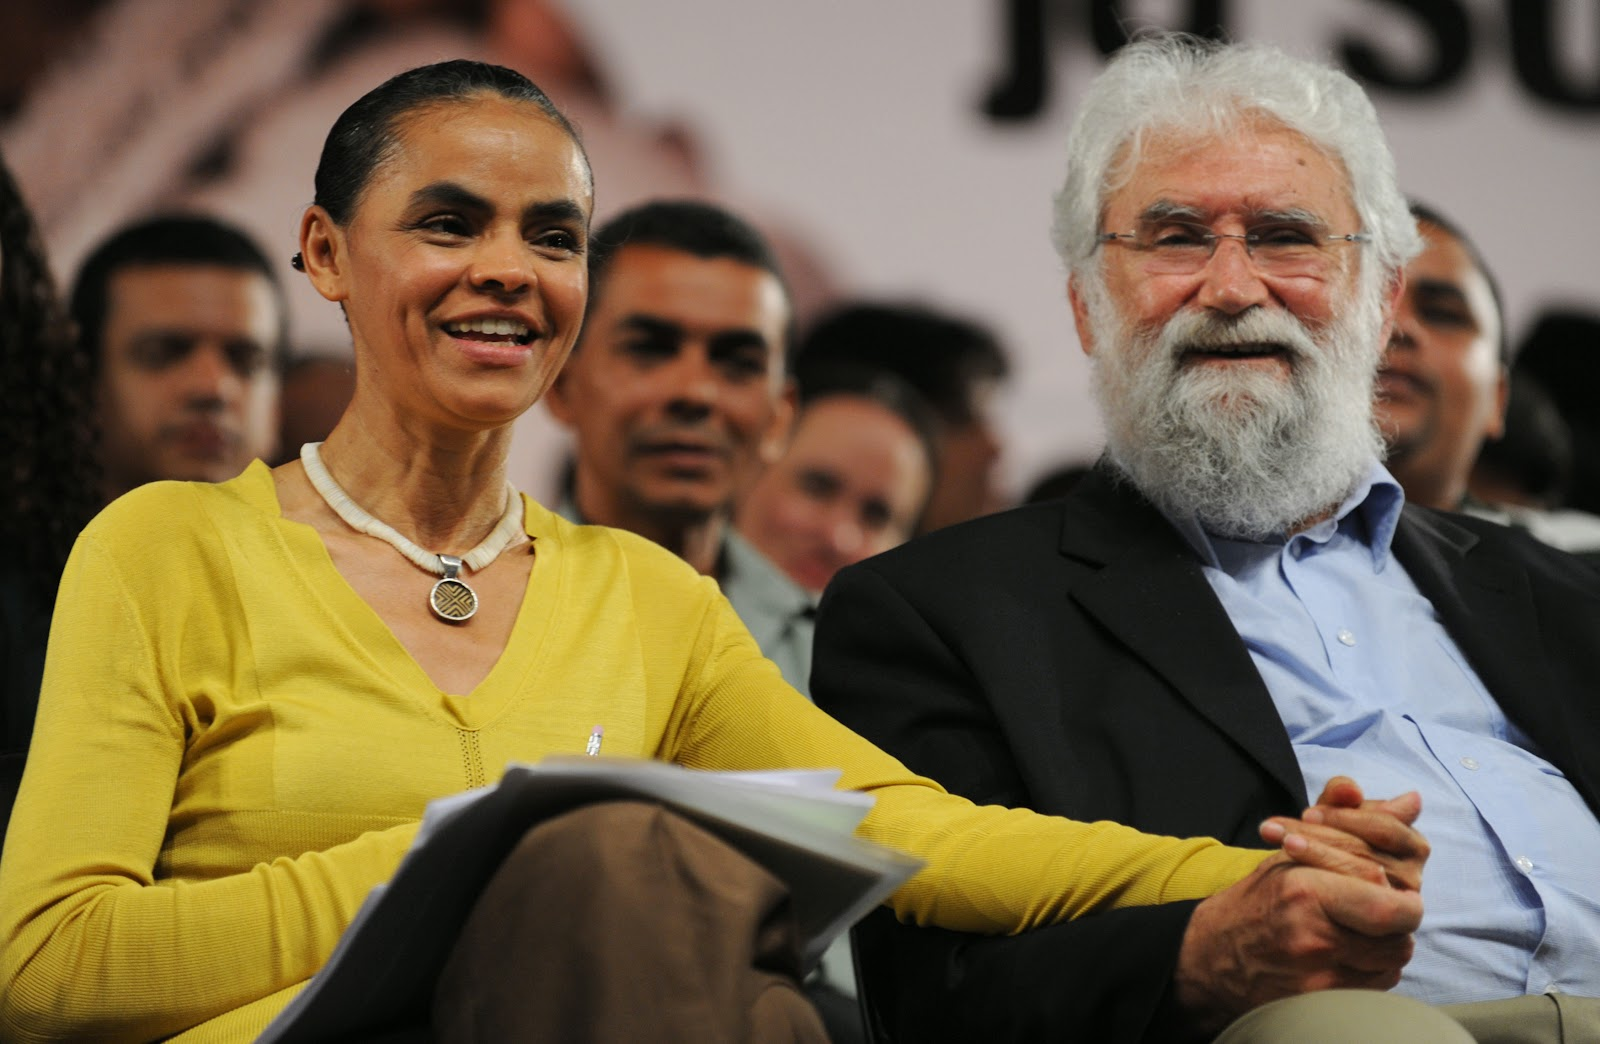 Marina Silva & Leonardo Boff, June 2010.